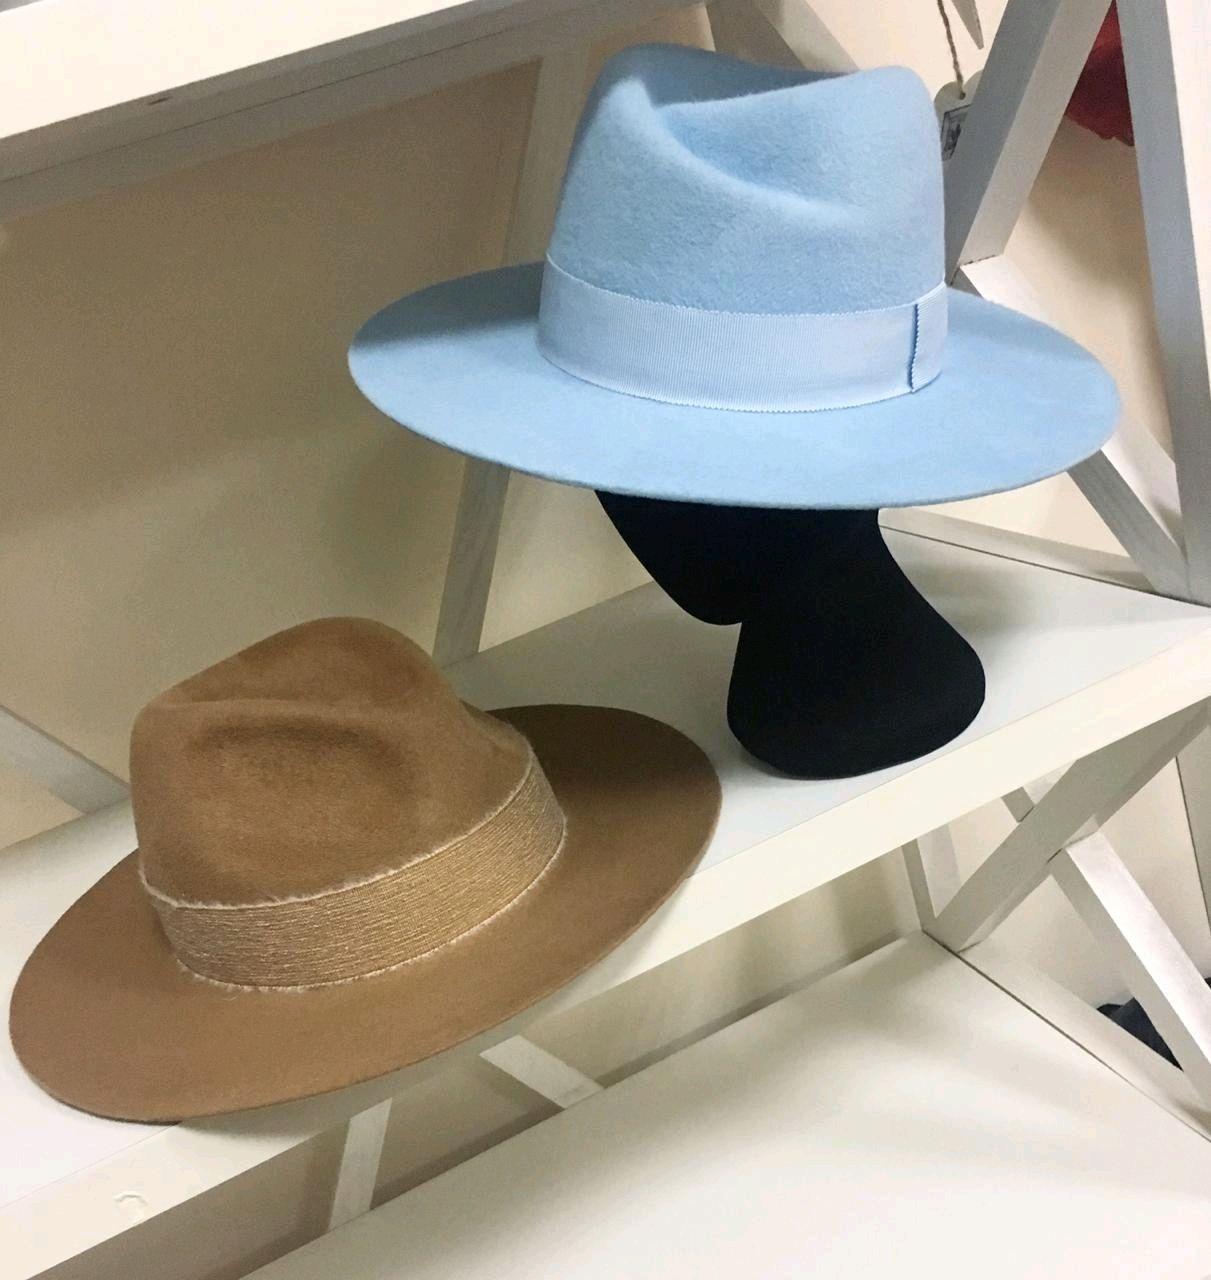 Шляпа Федора, Шляпы, Москва, Фото №1